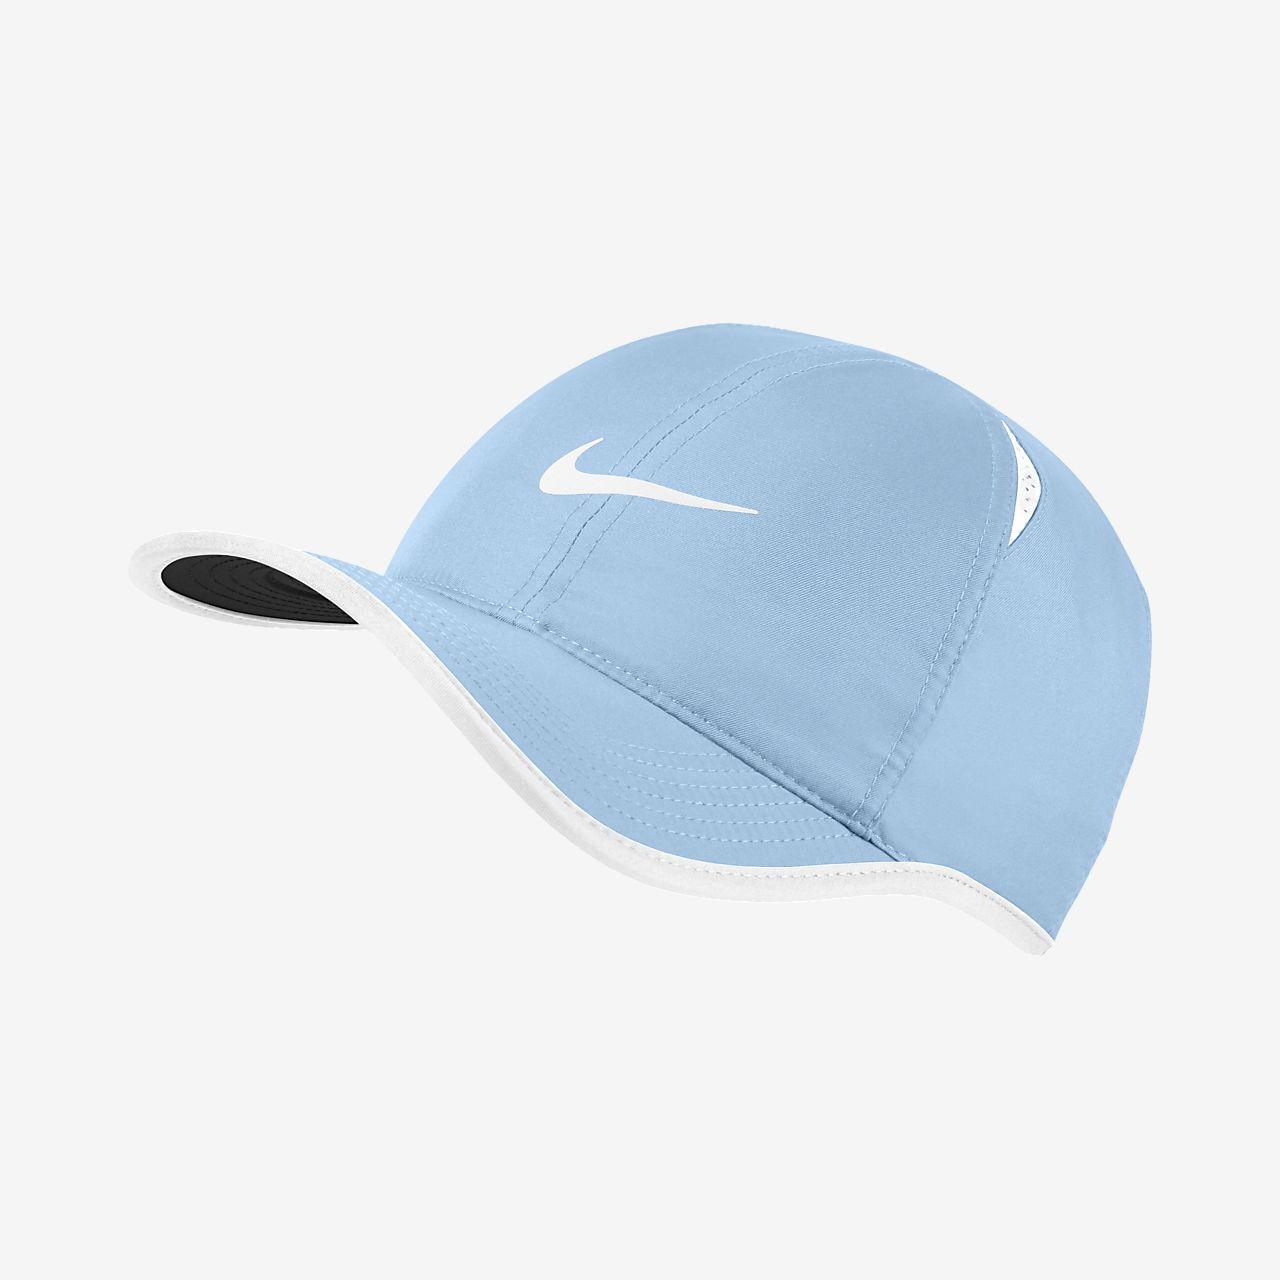 544403b955444 NikeCourt Featherlight Adjustable Tennis Hat. Nike.com SI